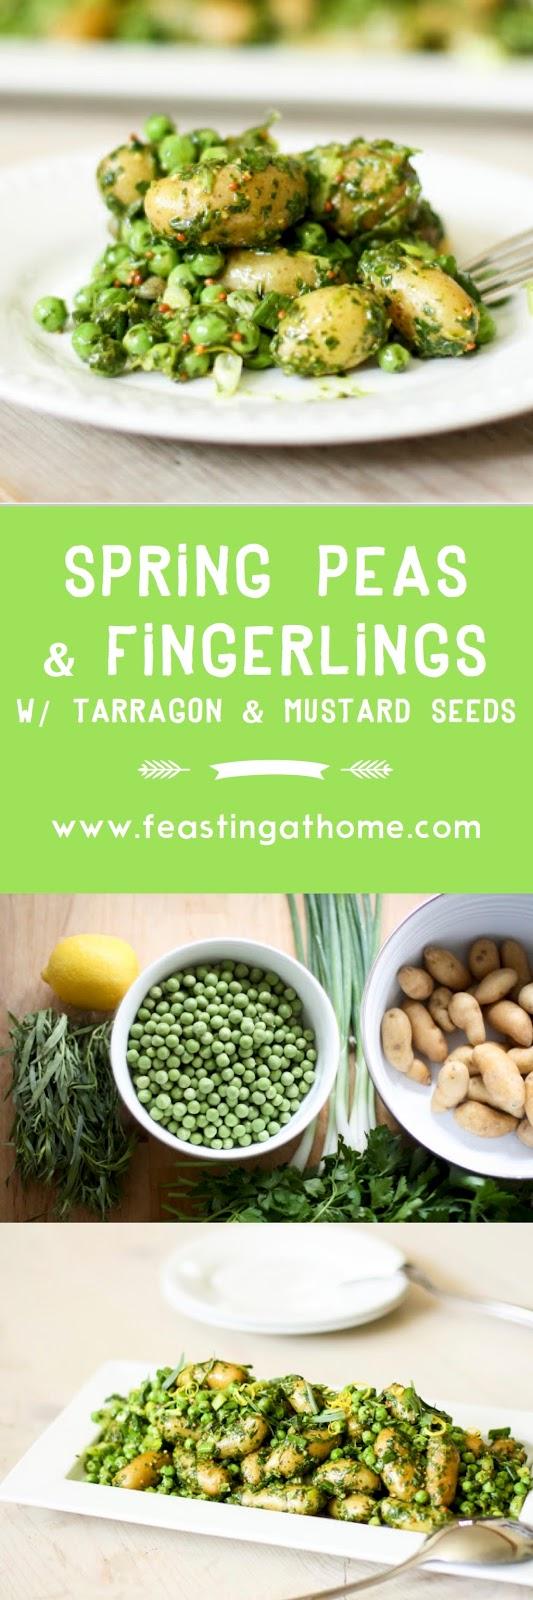 Fingerling potatoes with peas, tarragon and mustard seeds| www.feastingathome.com